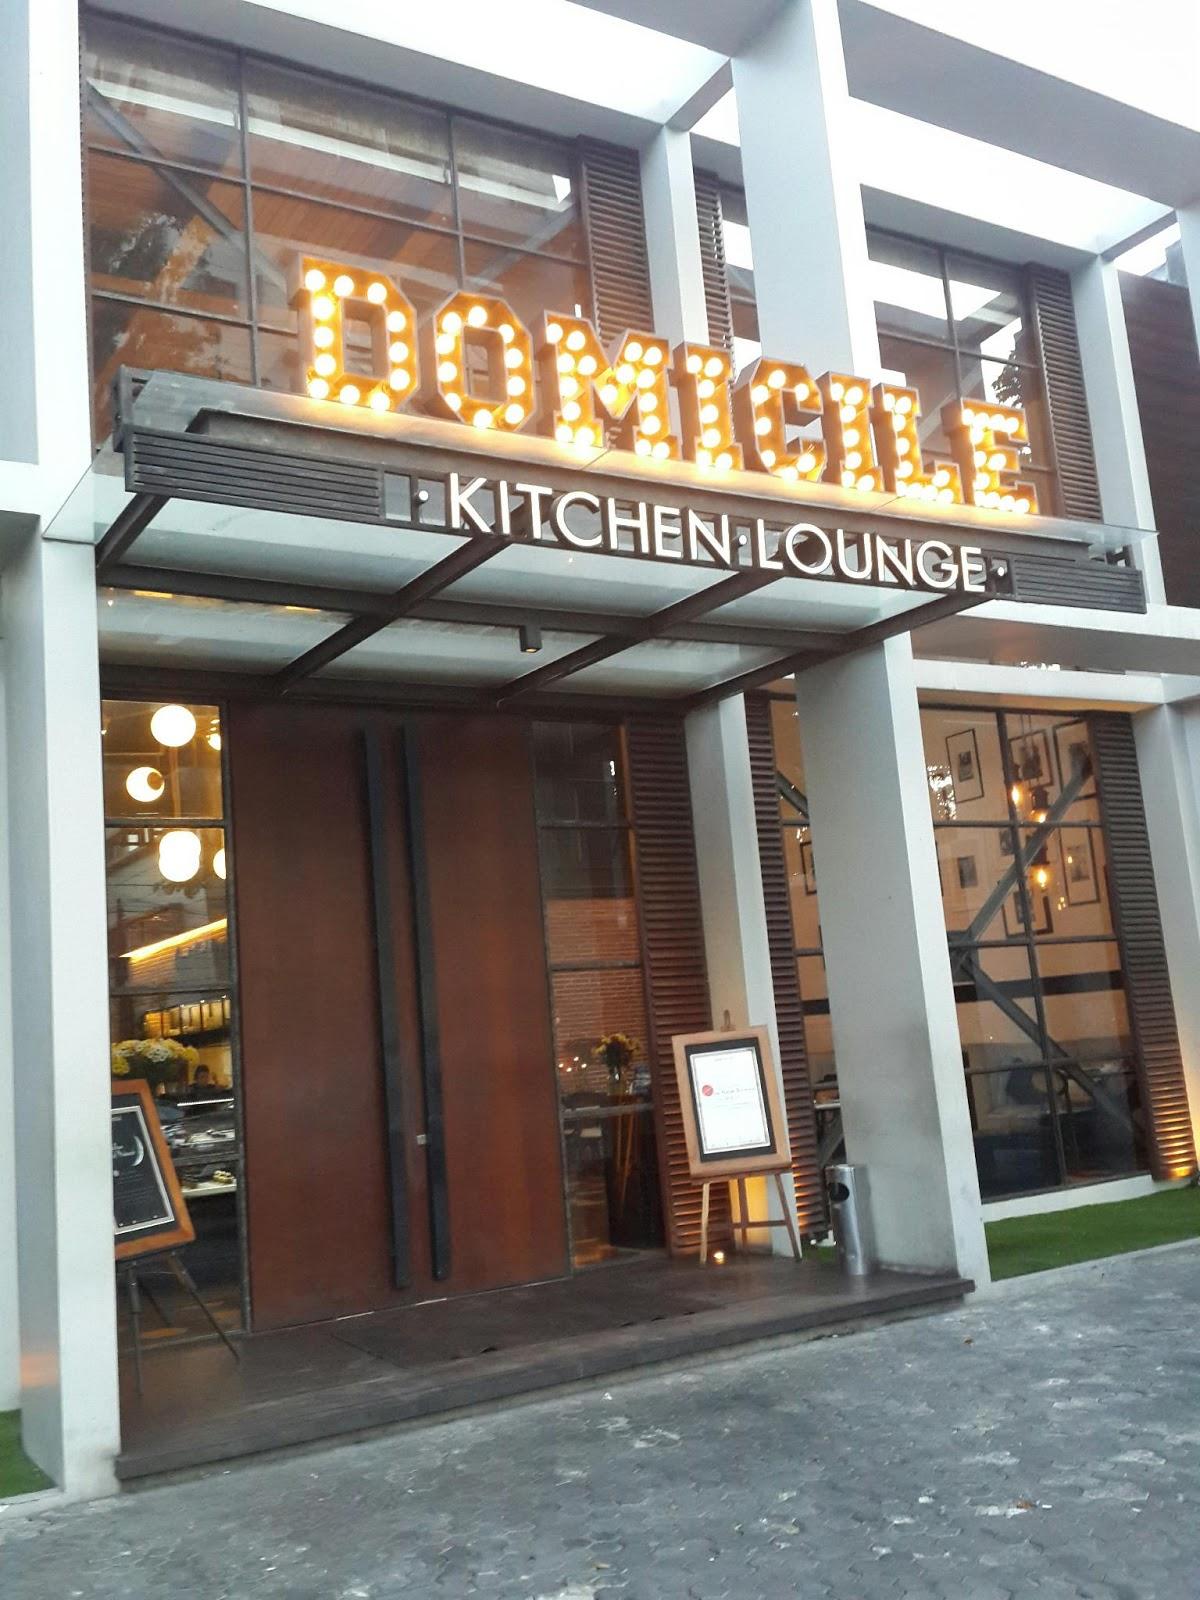 DOMICILE KITCHEN LOUNGE, THE MOST FAVORITE CAFE IN SURABAYA?